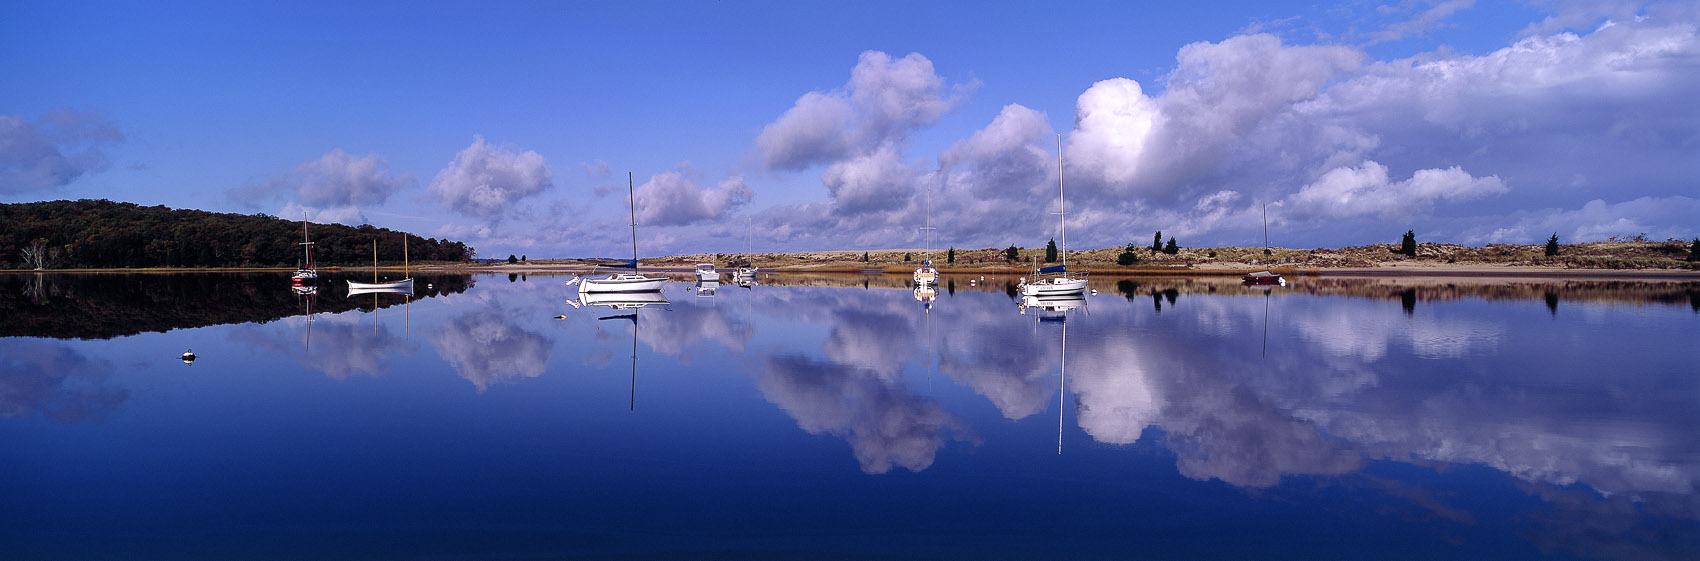 Boats_CalmAfterAStorm